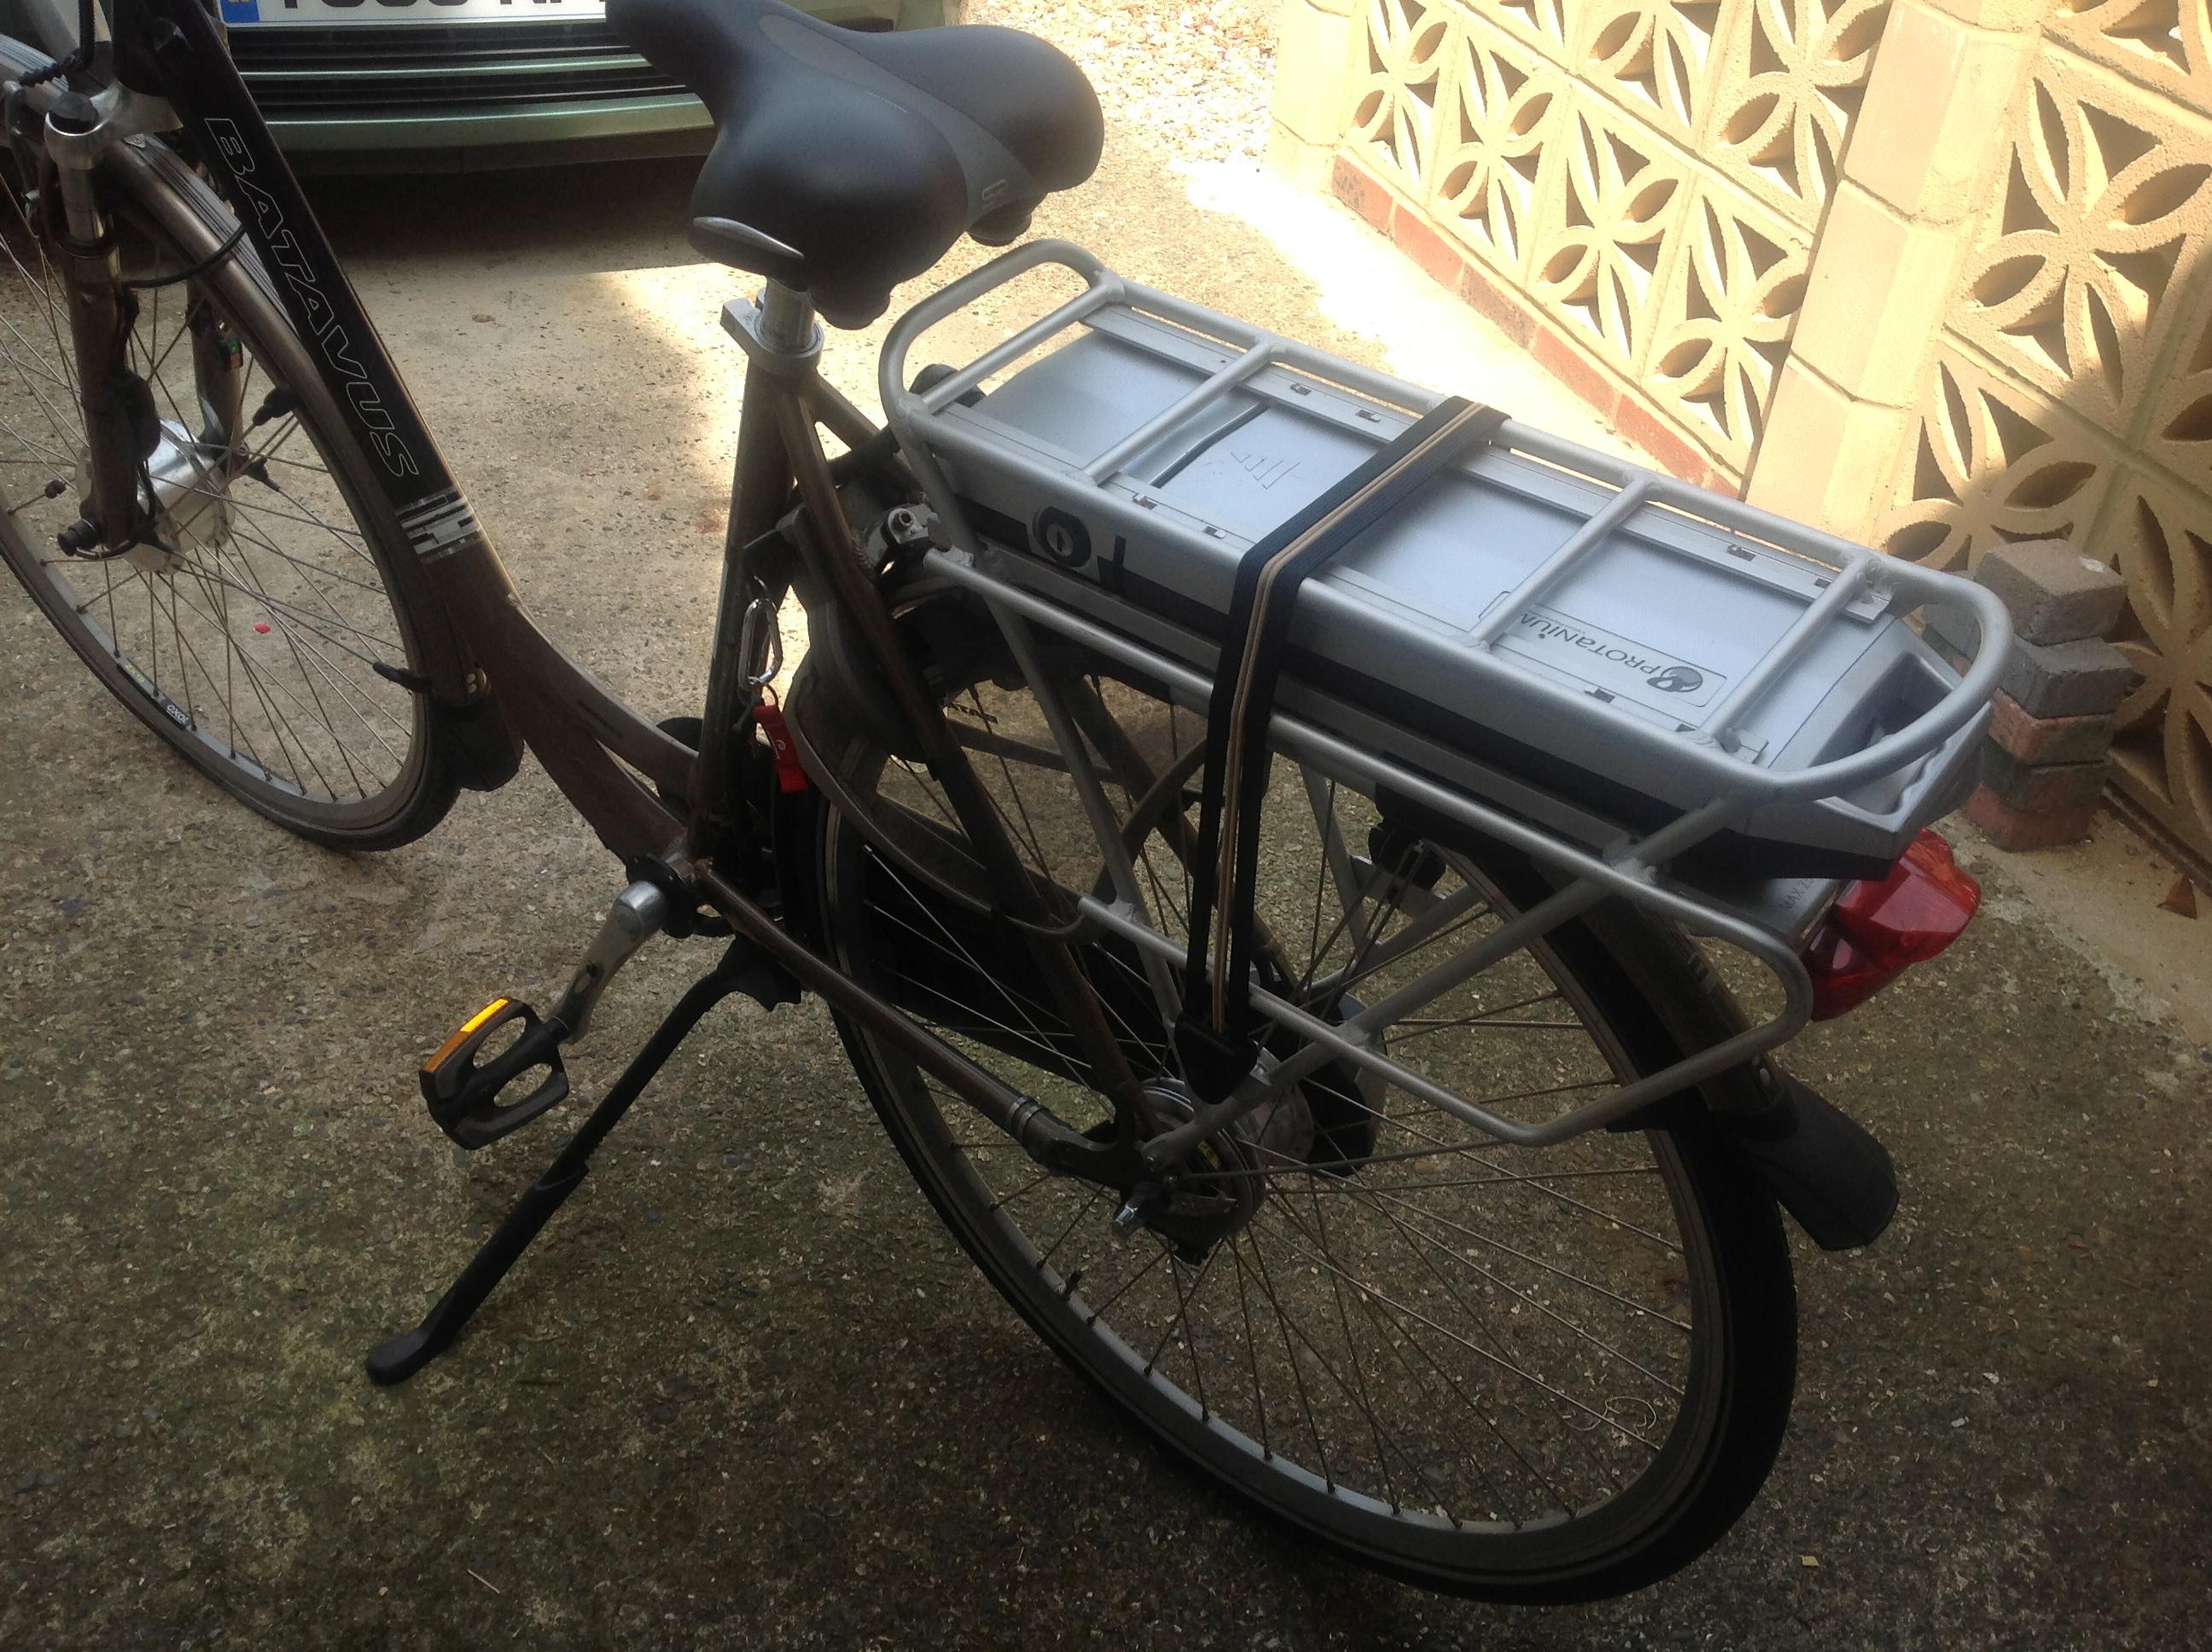 04b3dc3e526 Used Electric bike for sale - The Dutch Bike Shop